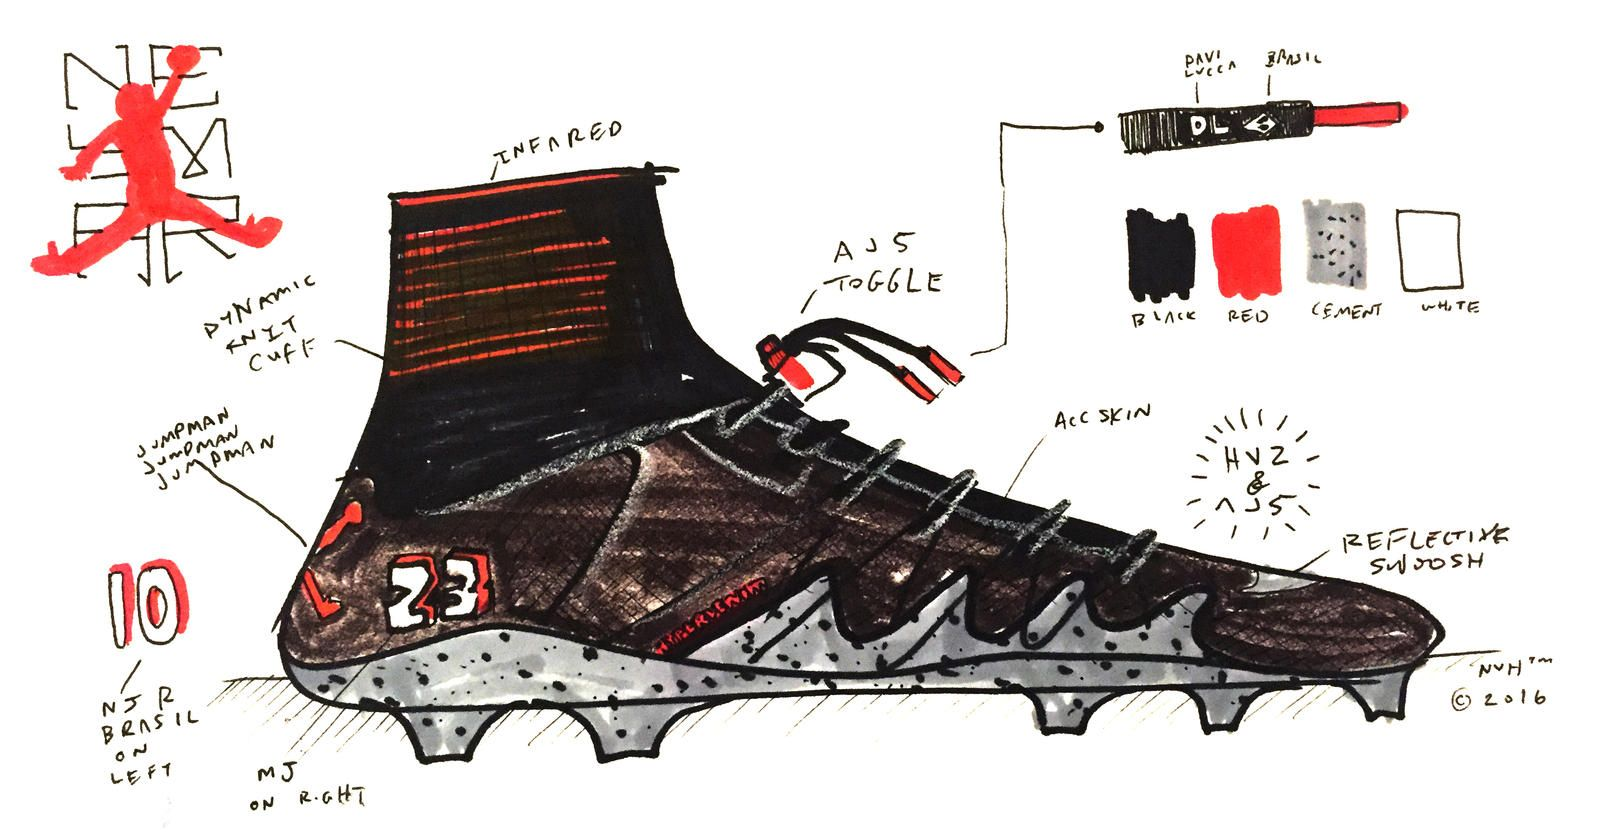 Nike News - NJR x JORDAN COLLECTION